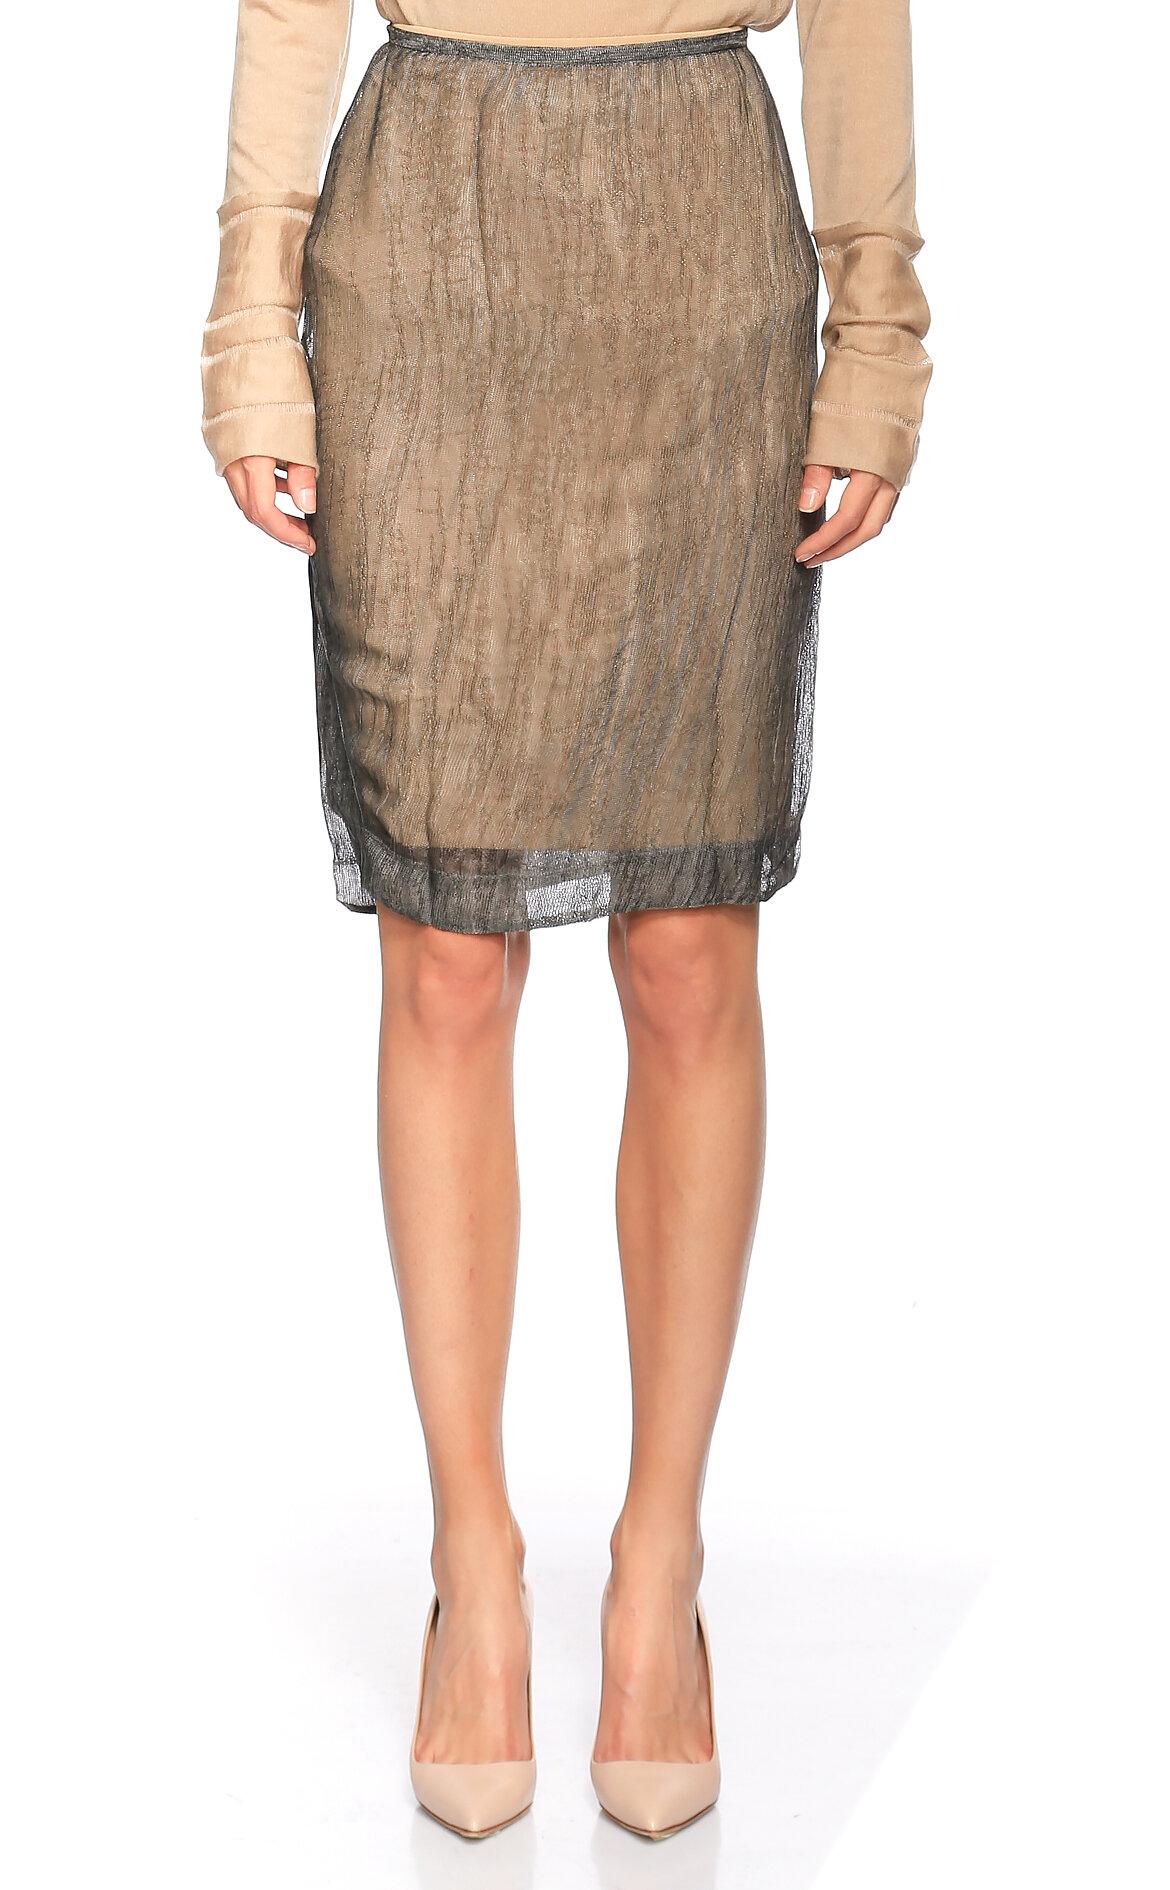 Donna Karan-Donna Karan Tül Detaylı Kalem Bej Sityah Etek